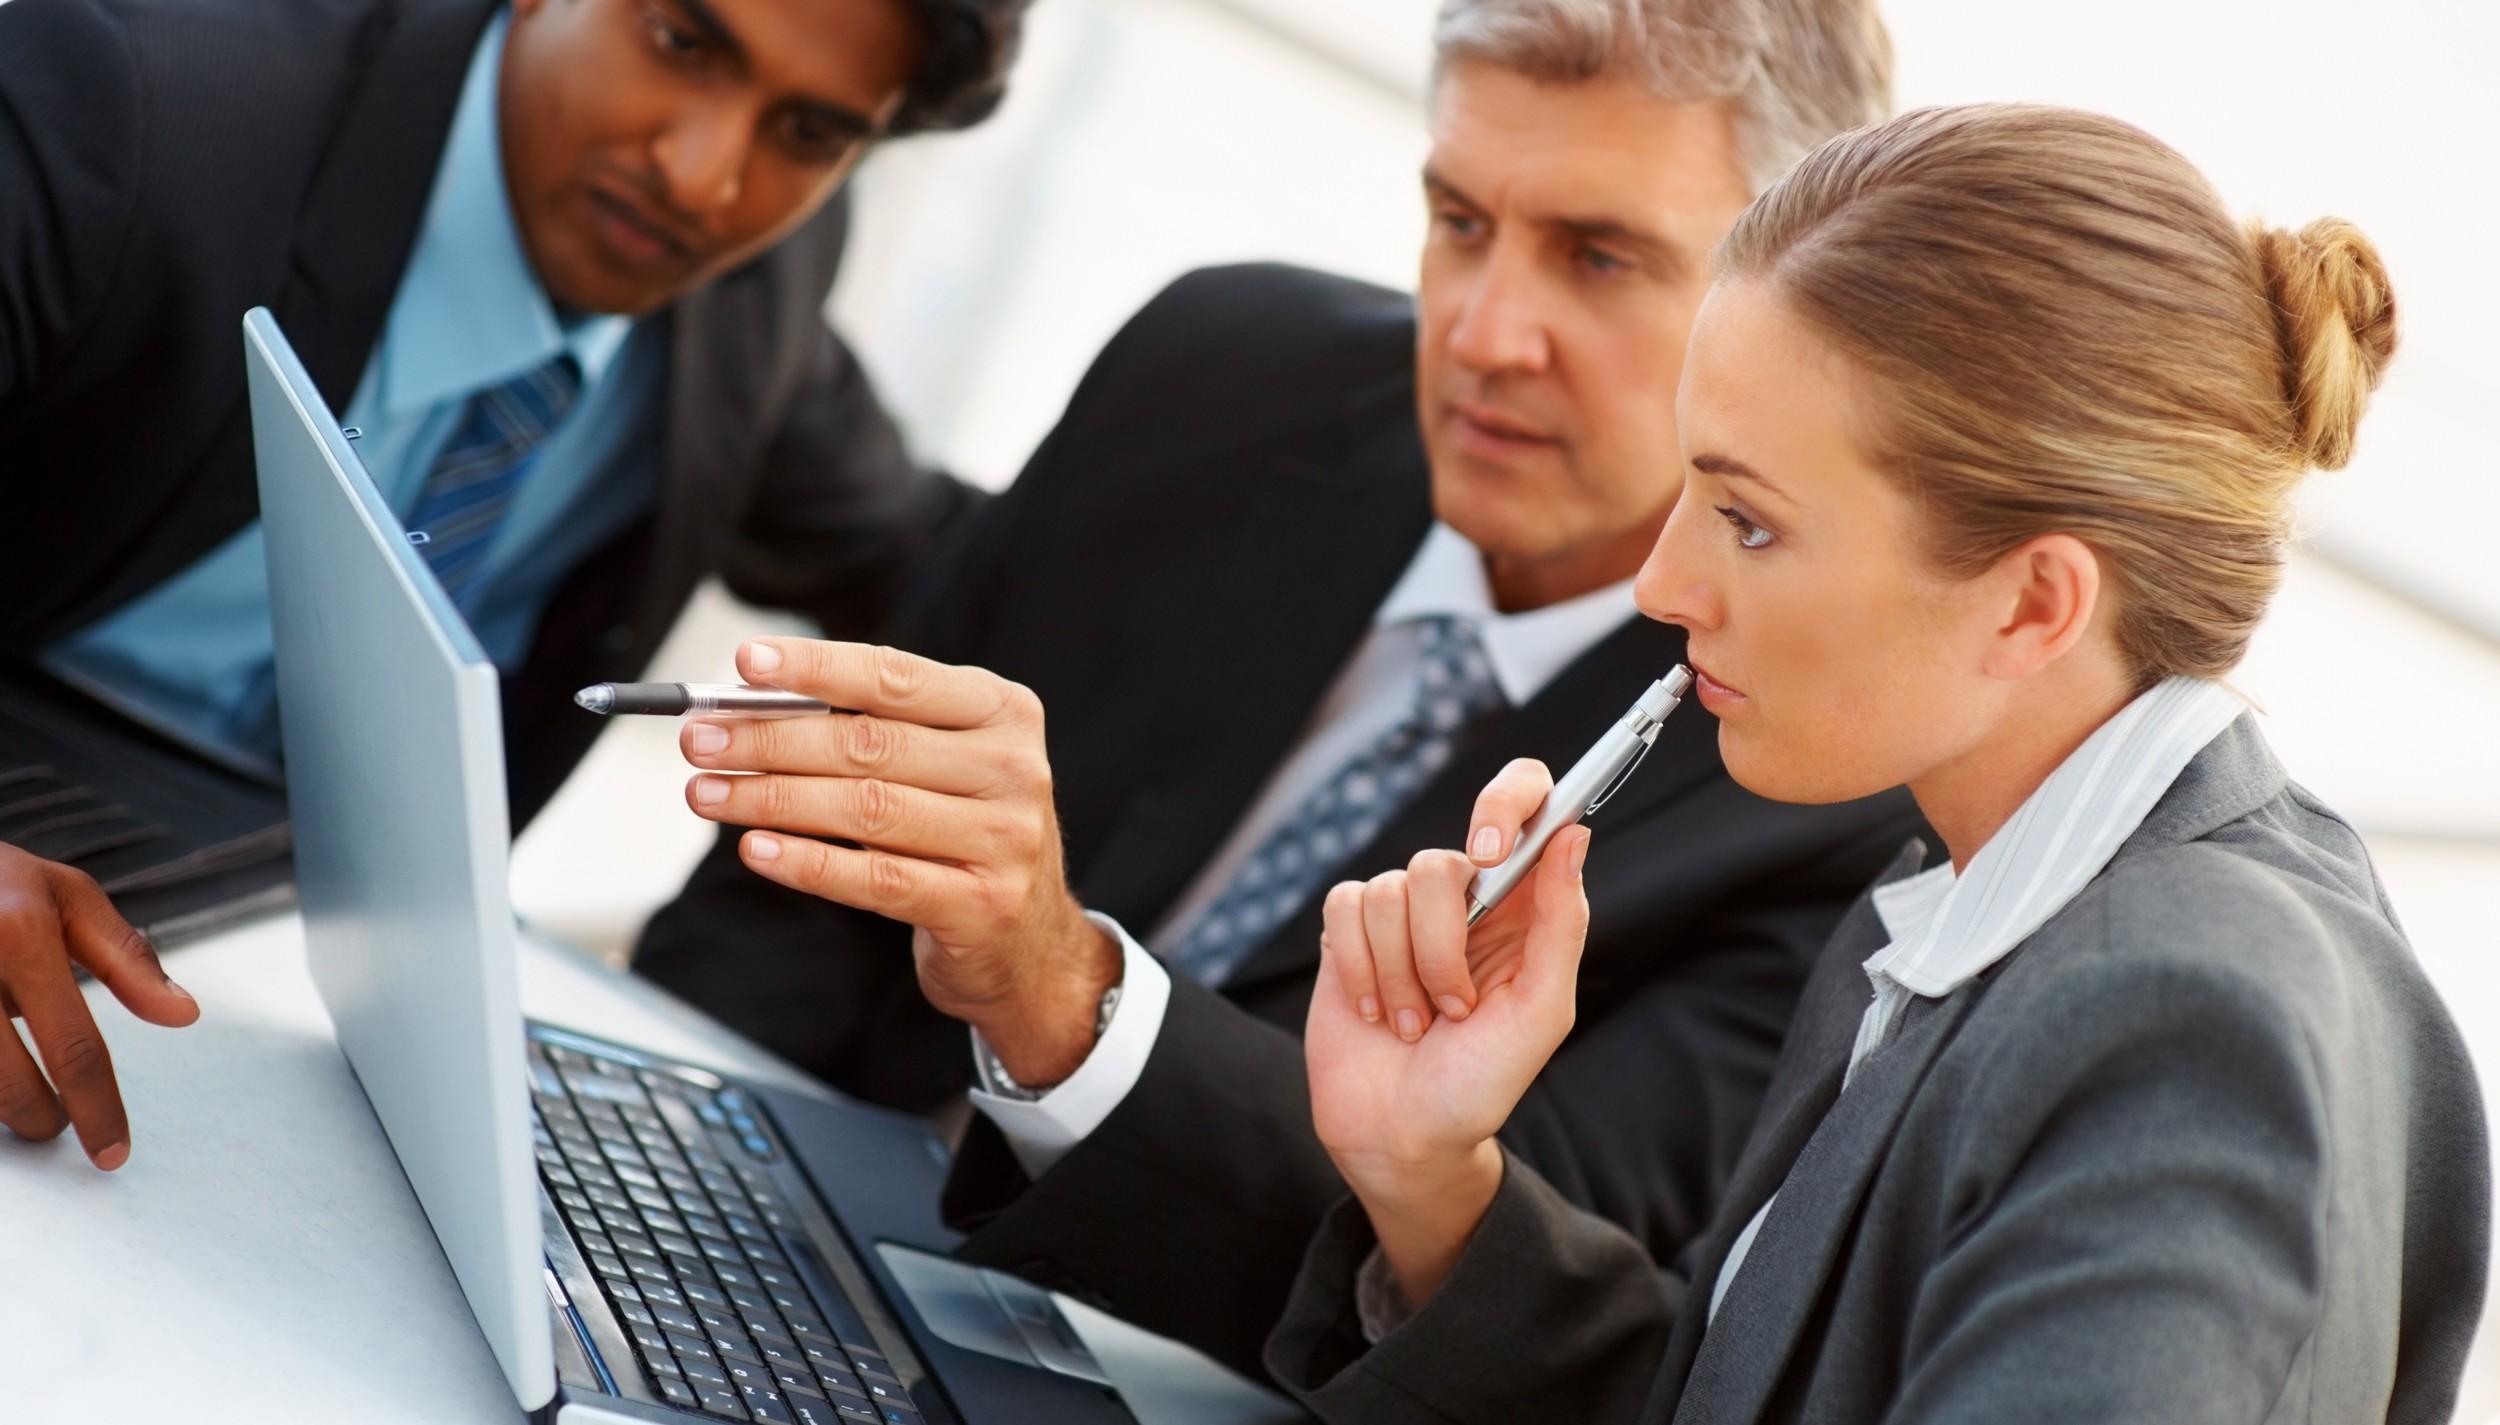 Business-meeting-photo-website-IDI-e1375141940267.jpg